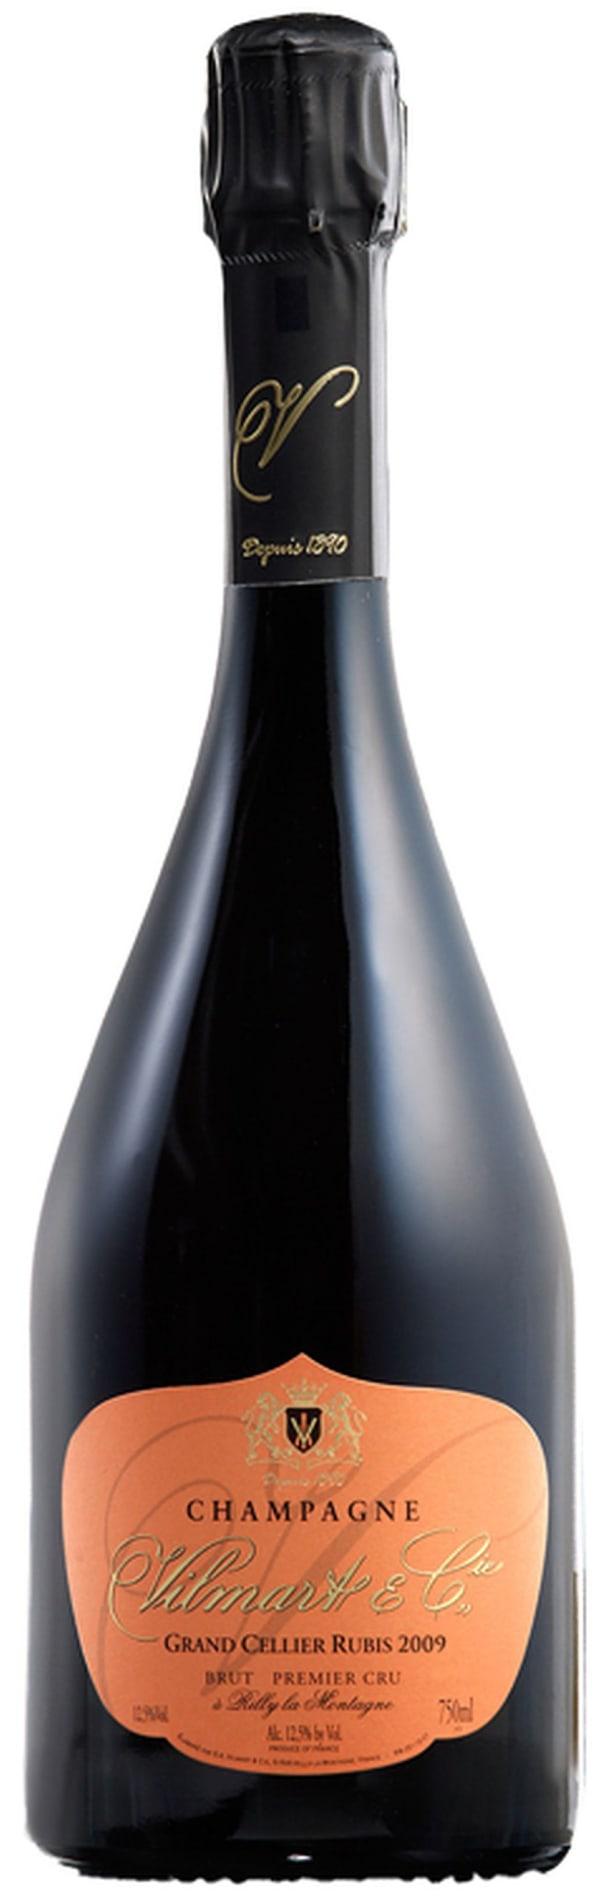 Vilmart & Cie Grand Cellier Rubis Rosé Champagne Brut 2010